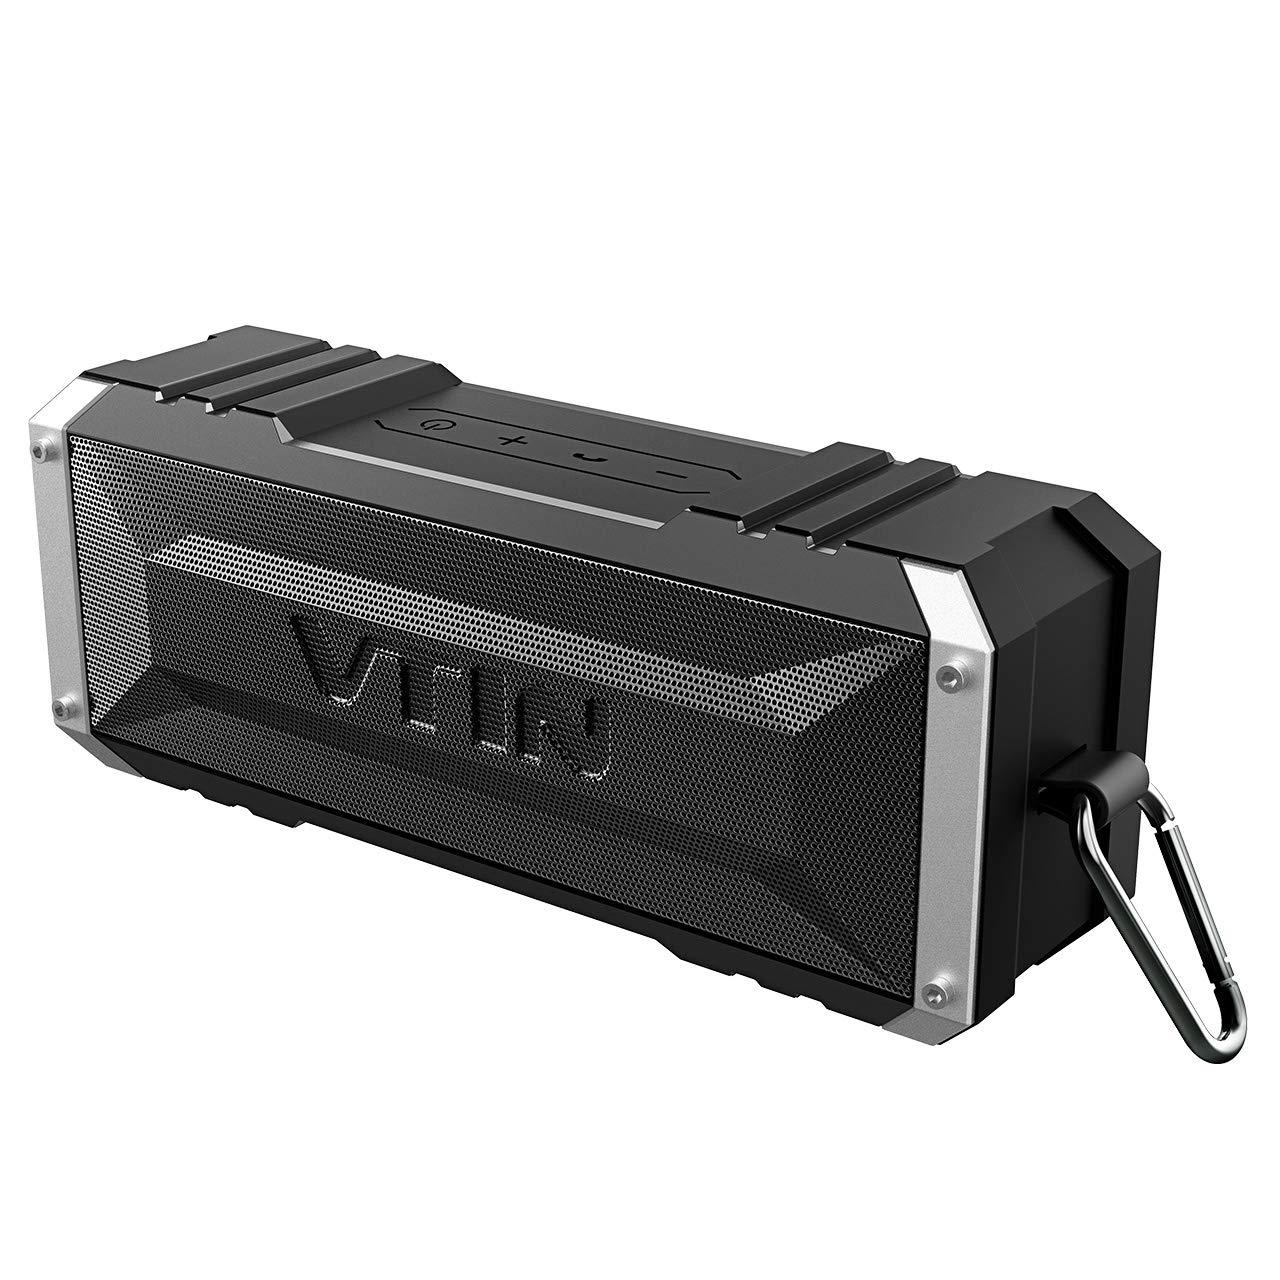 Parlante Portatil Vtin Punker 20watts Bluettoth 30hr Ipx5